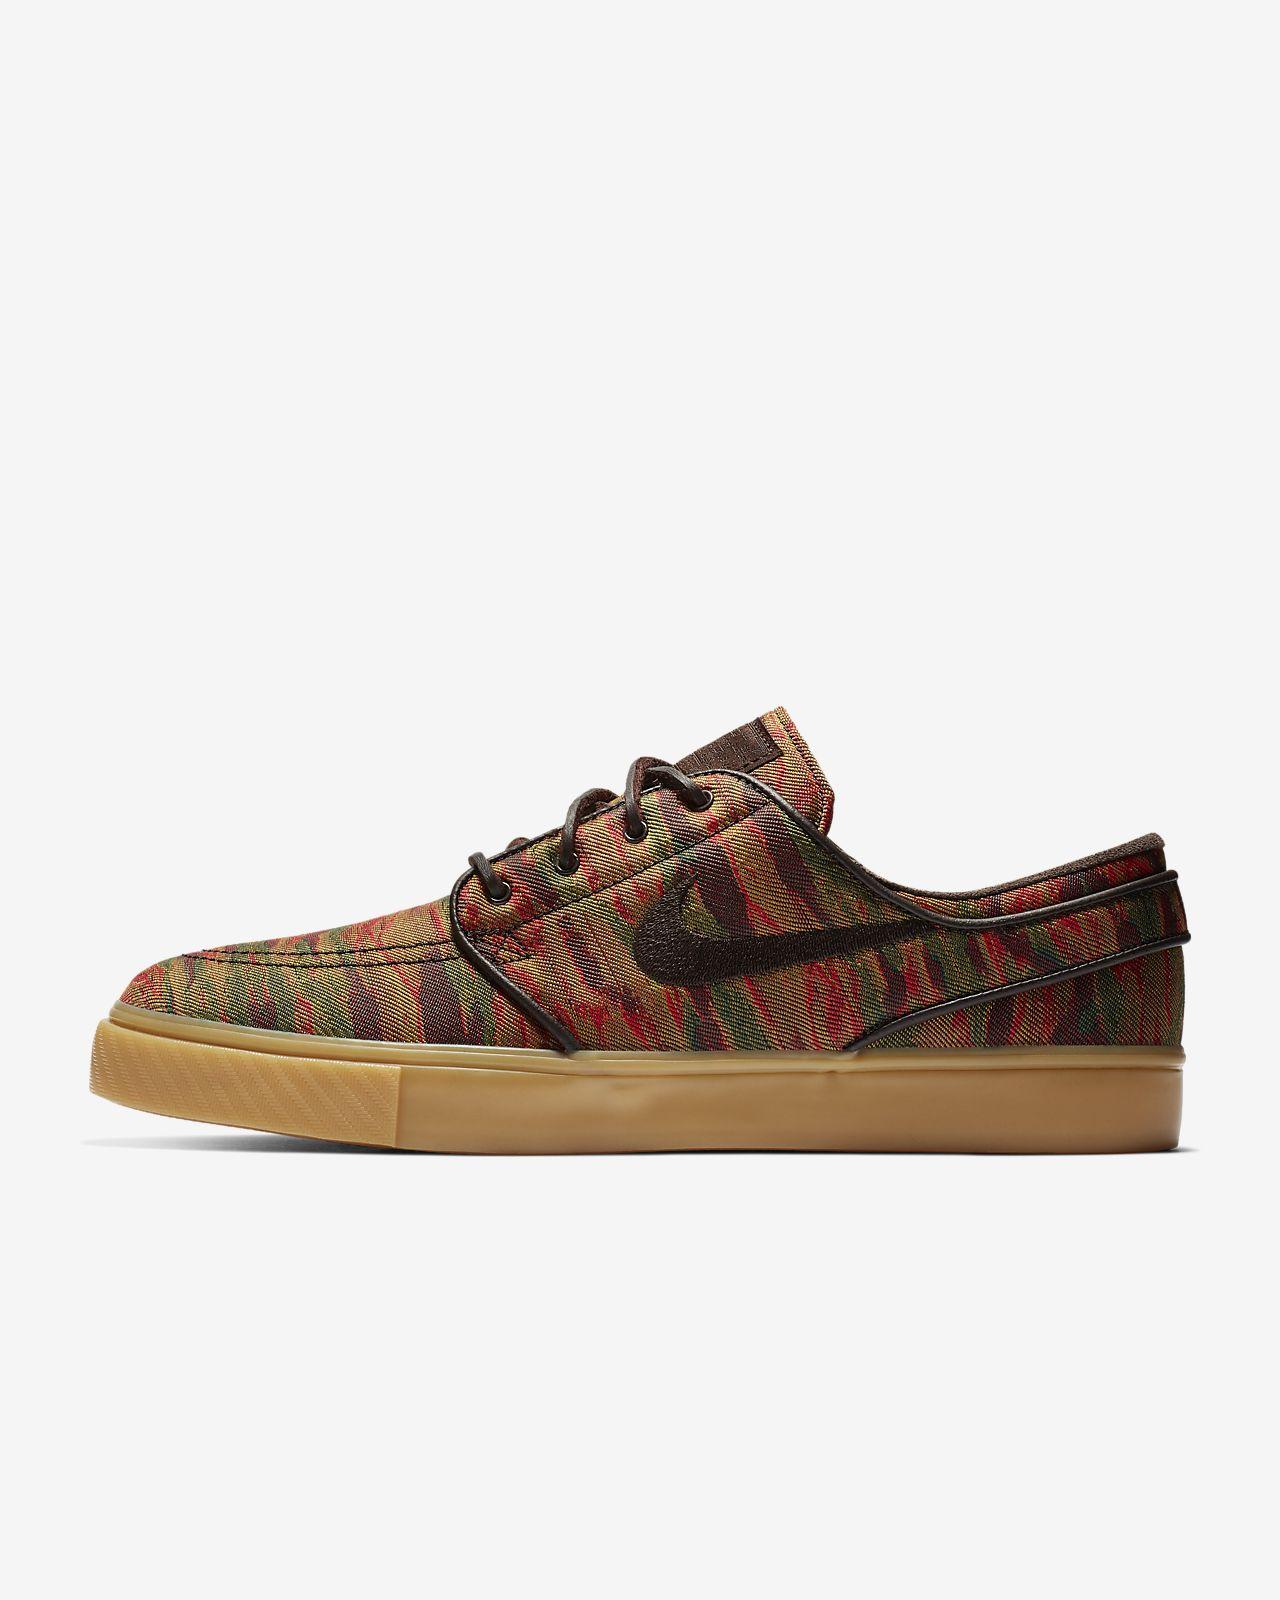 Nike SB Zoom Stefan Janoski Canvas Premium Herren-Skateboardschuh